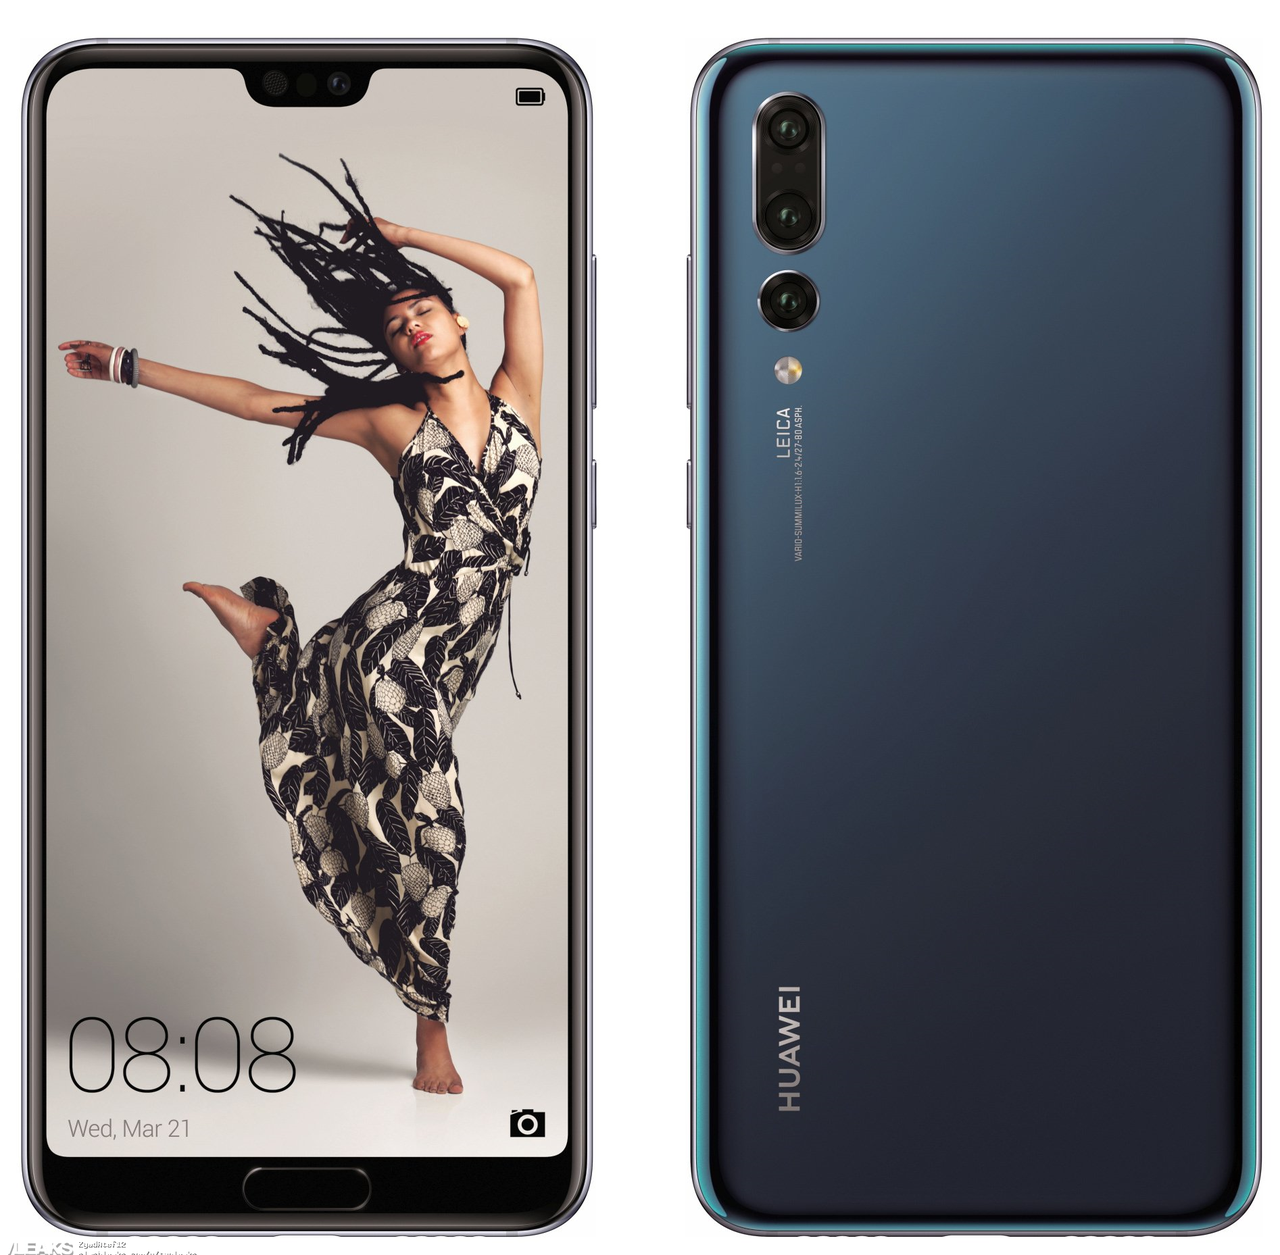 "Смартфон Huawei P20 Pro 6/128GB Blue, 40+20+8/24Мп, 6.1"" OLED, 2sim, 4000 мА*ч, Kirin 970, 8 ядер, 4G (LTE)"